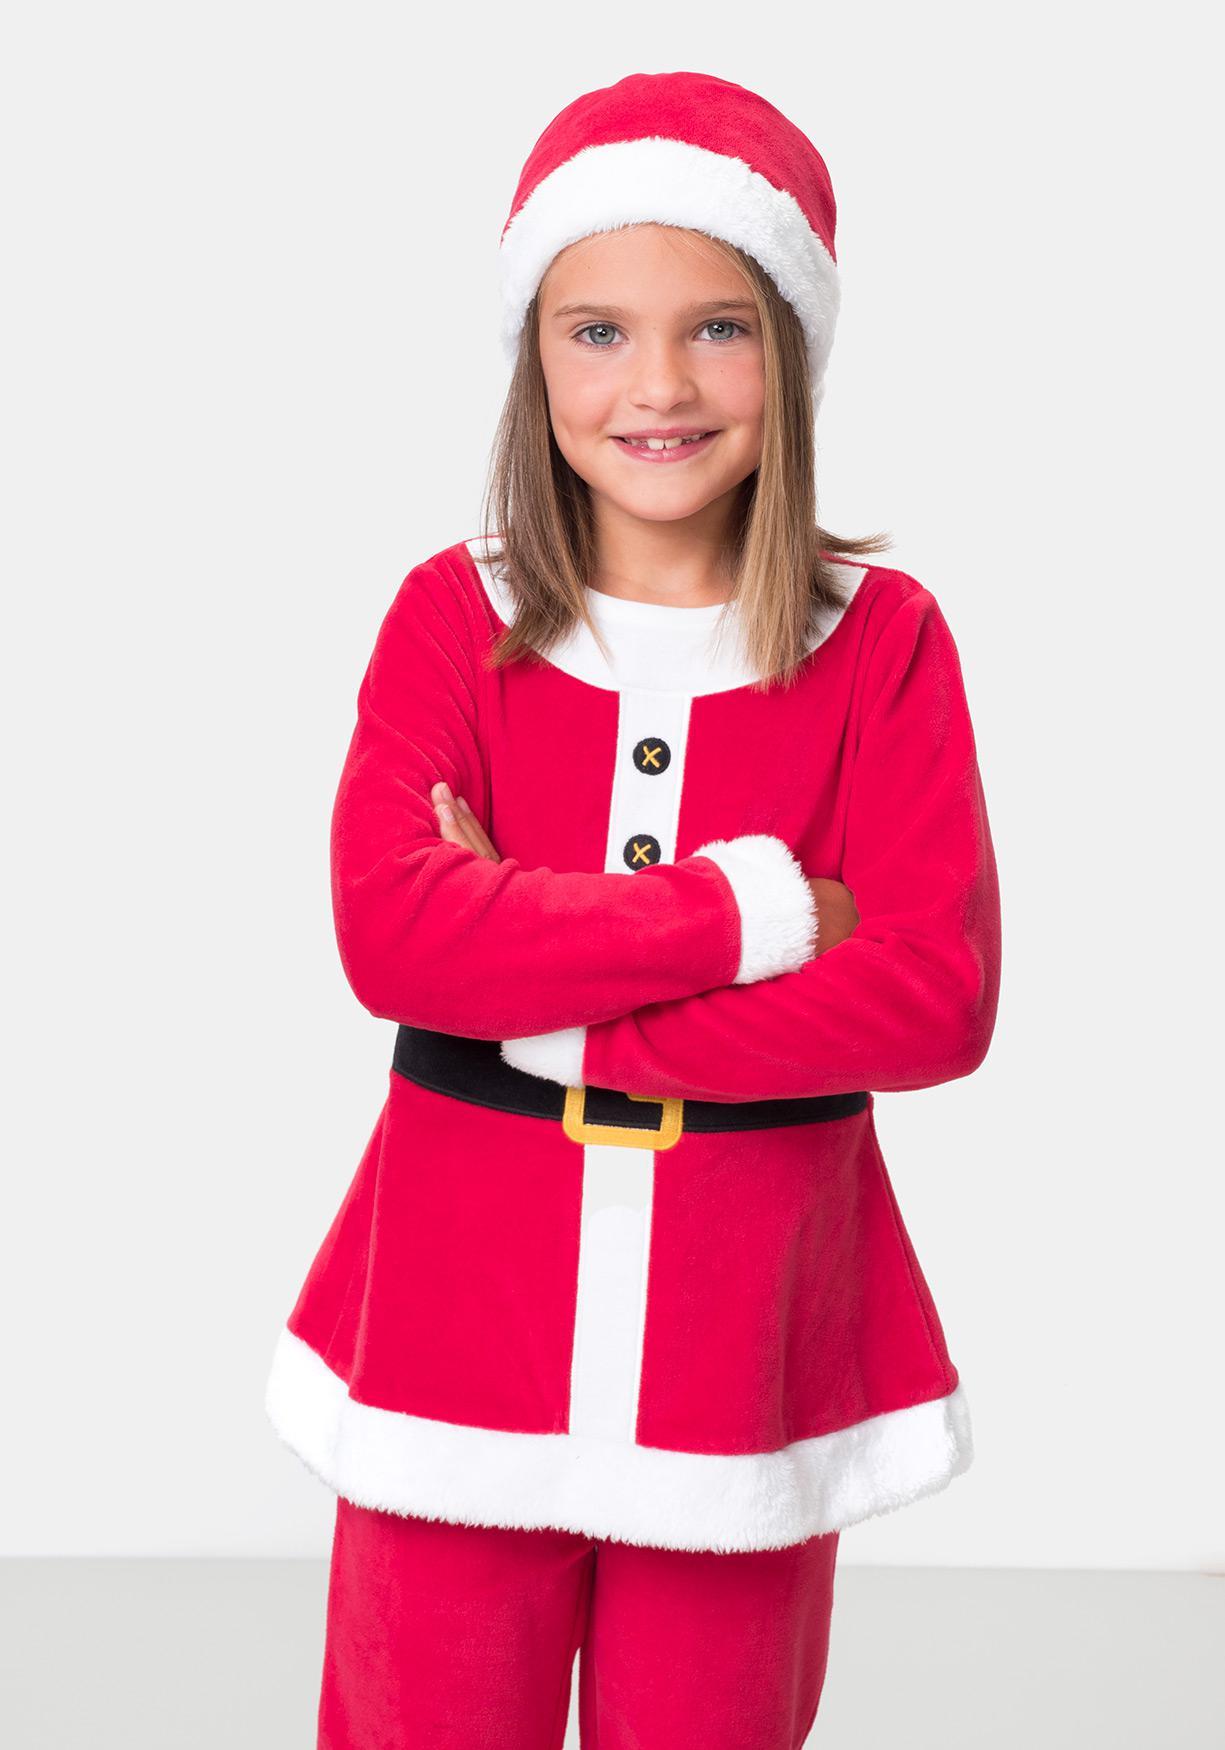 Comprar Pijama de Mamá Noel con gorrito TEX. ¡Aprovéchate de ... e31685cdbc2